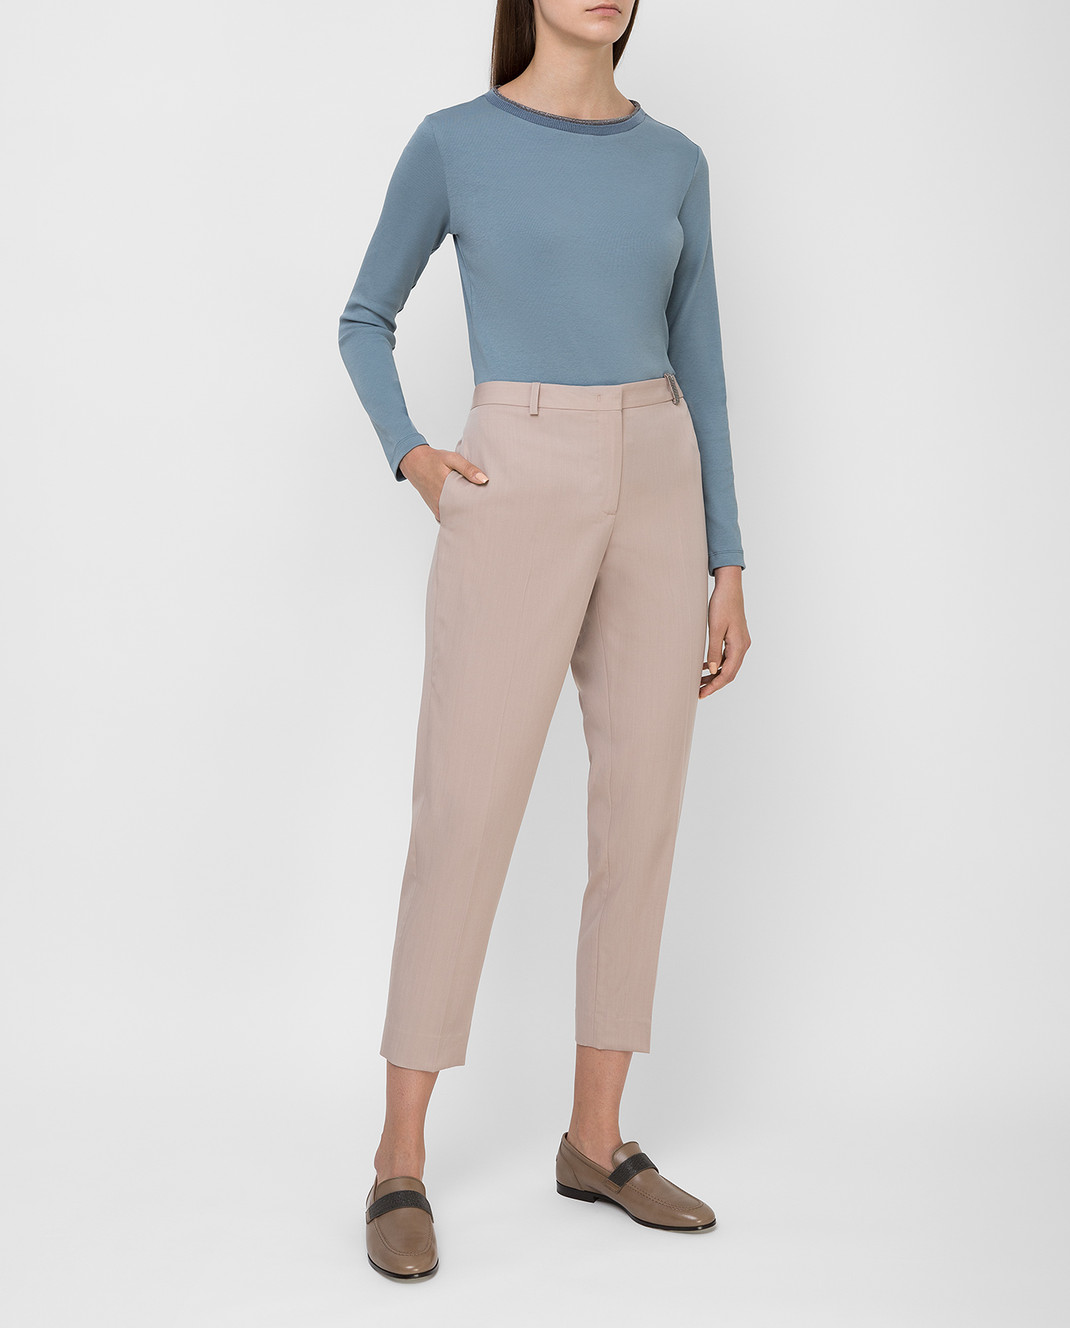 Fabiana Filippi Бежевые брюки из шерсти изображение 2